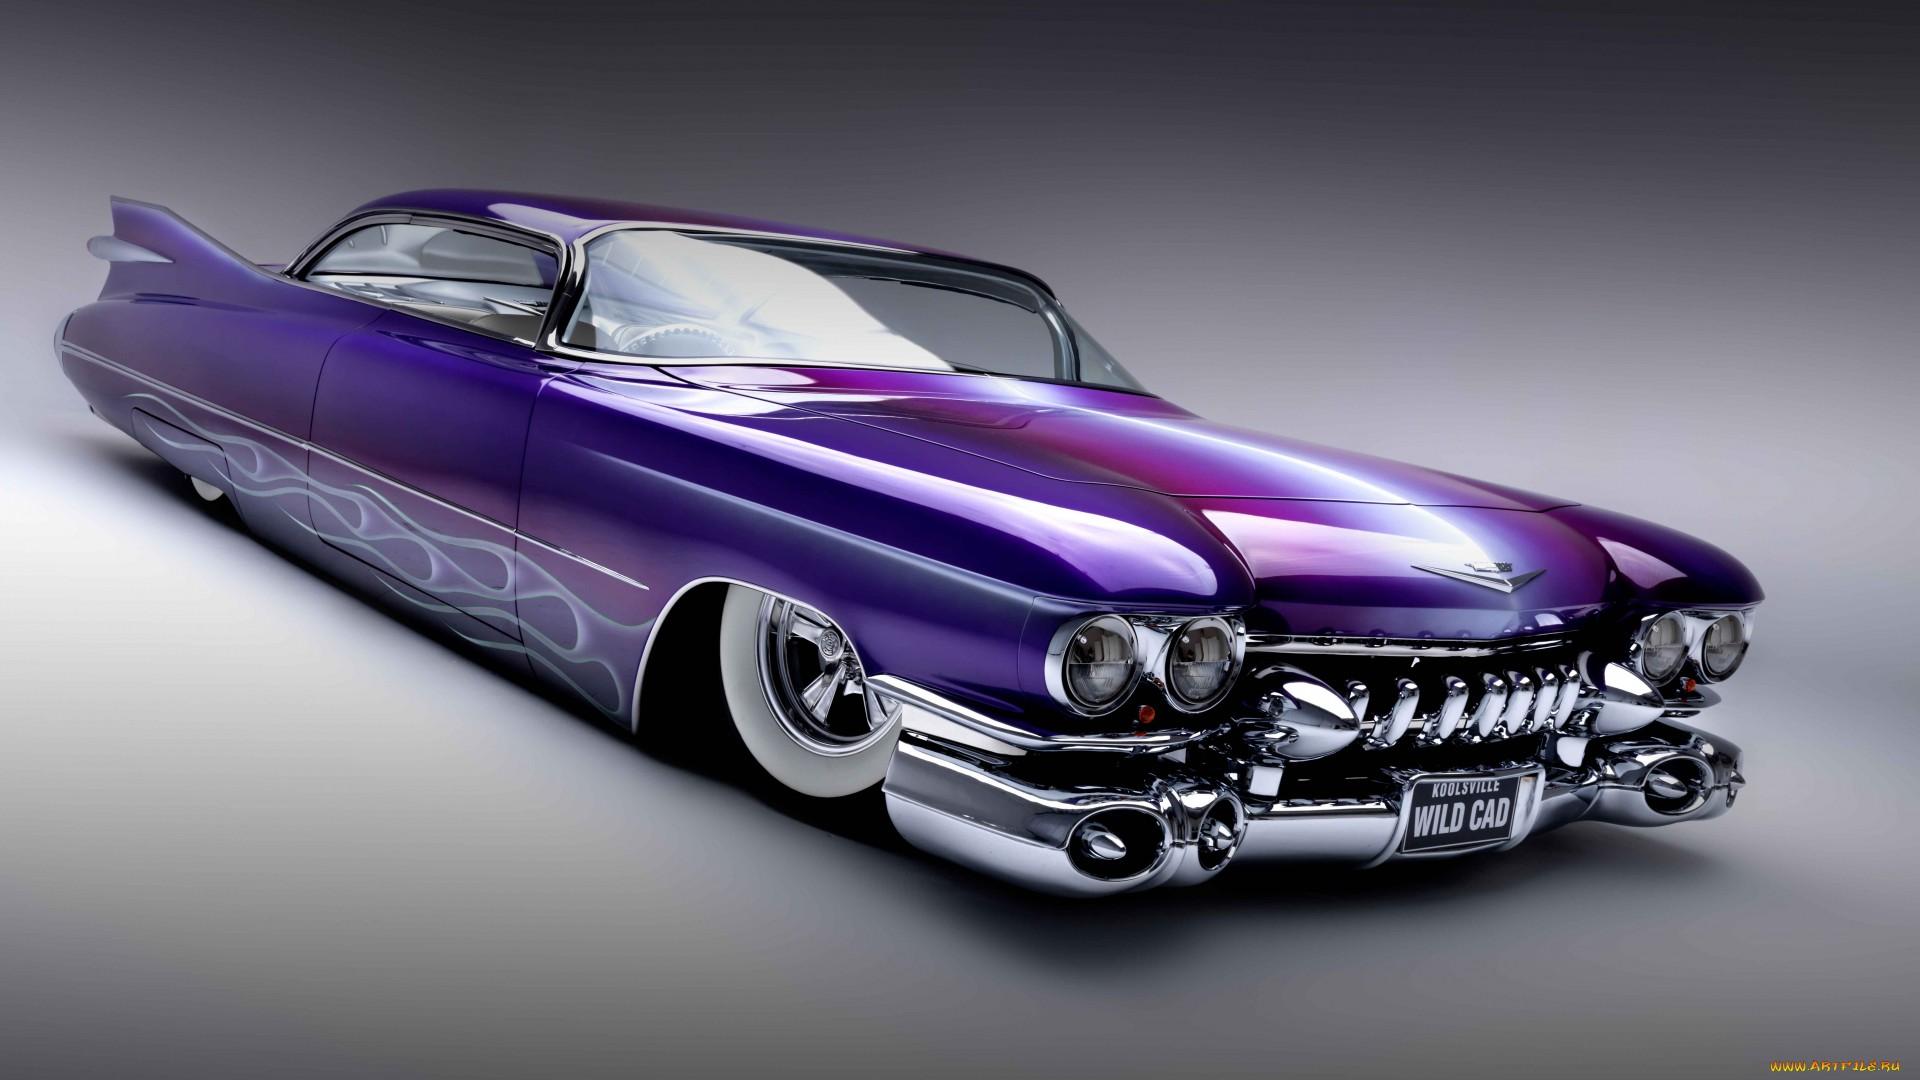 Cool Cadillac Wallpapers Wallpapersafari